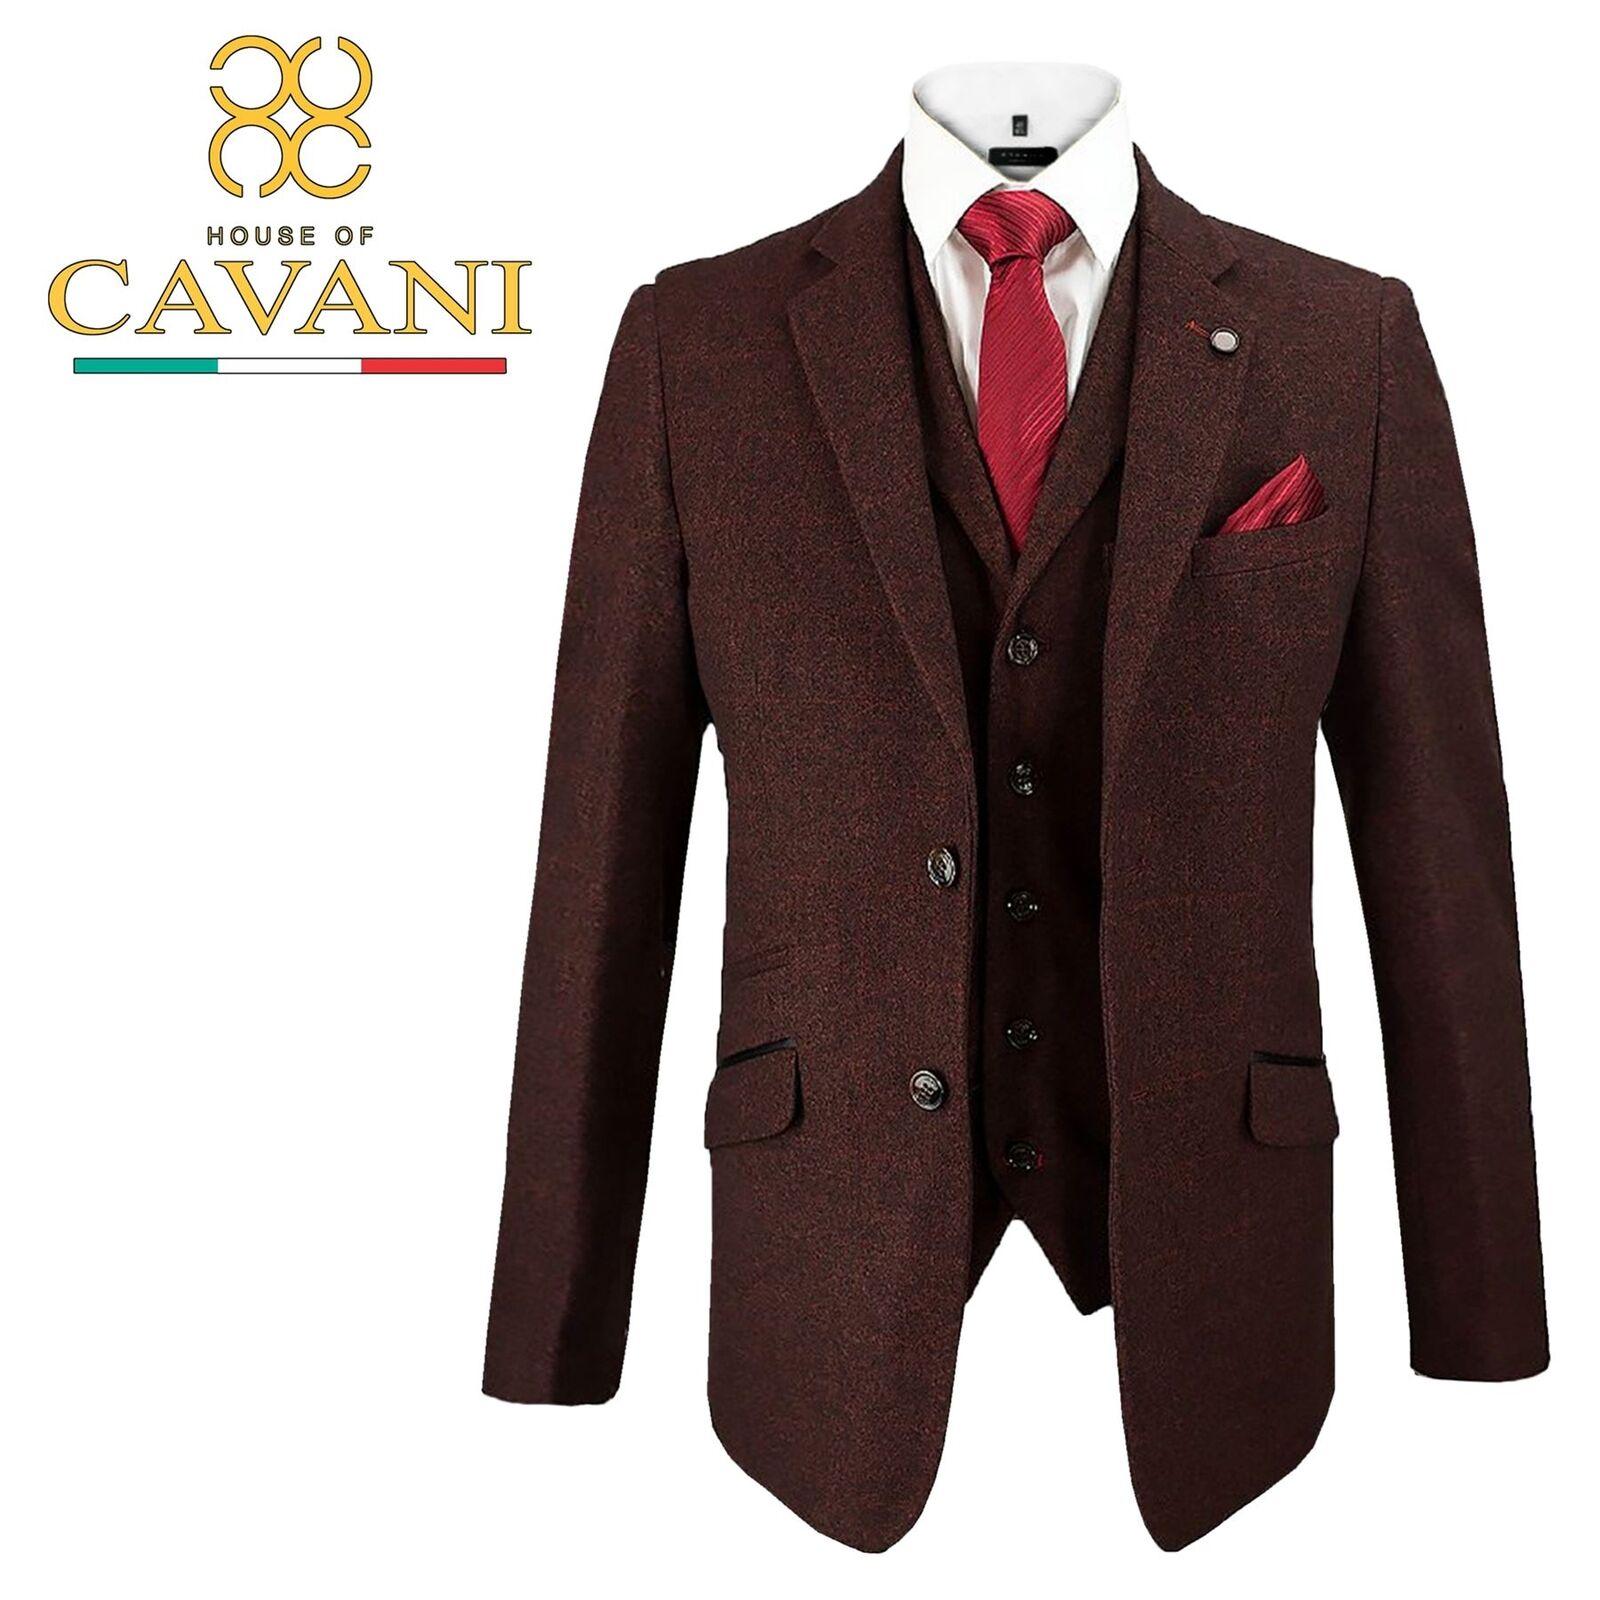 Herren Cavani Draco Tweed Blazer Waistcoat Trousers 3 Piece Suit Sold Separately